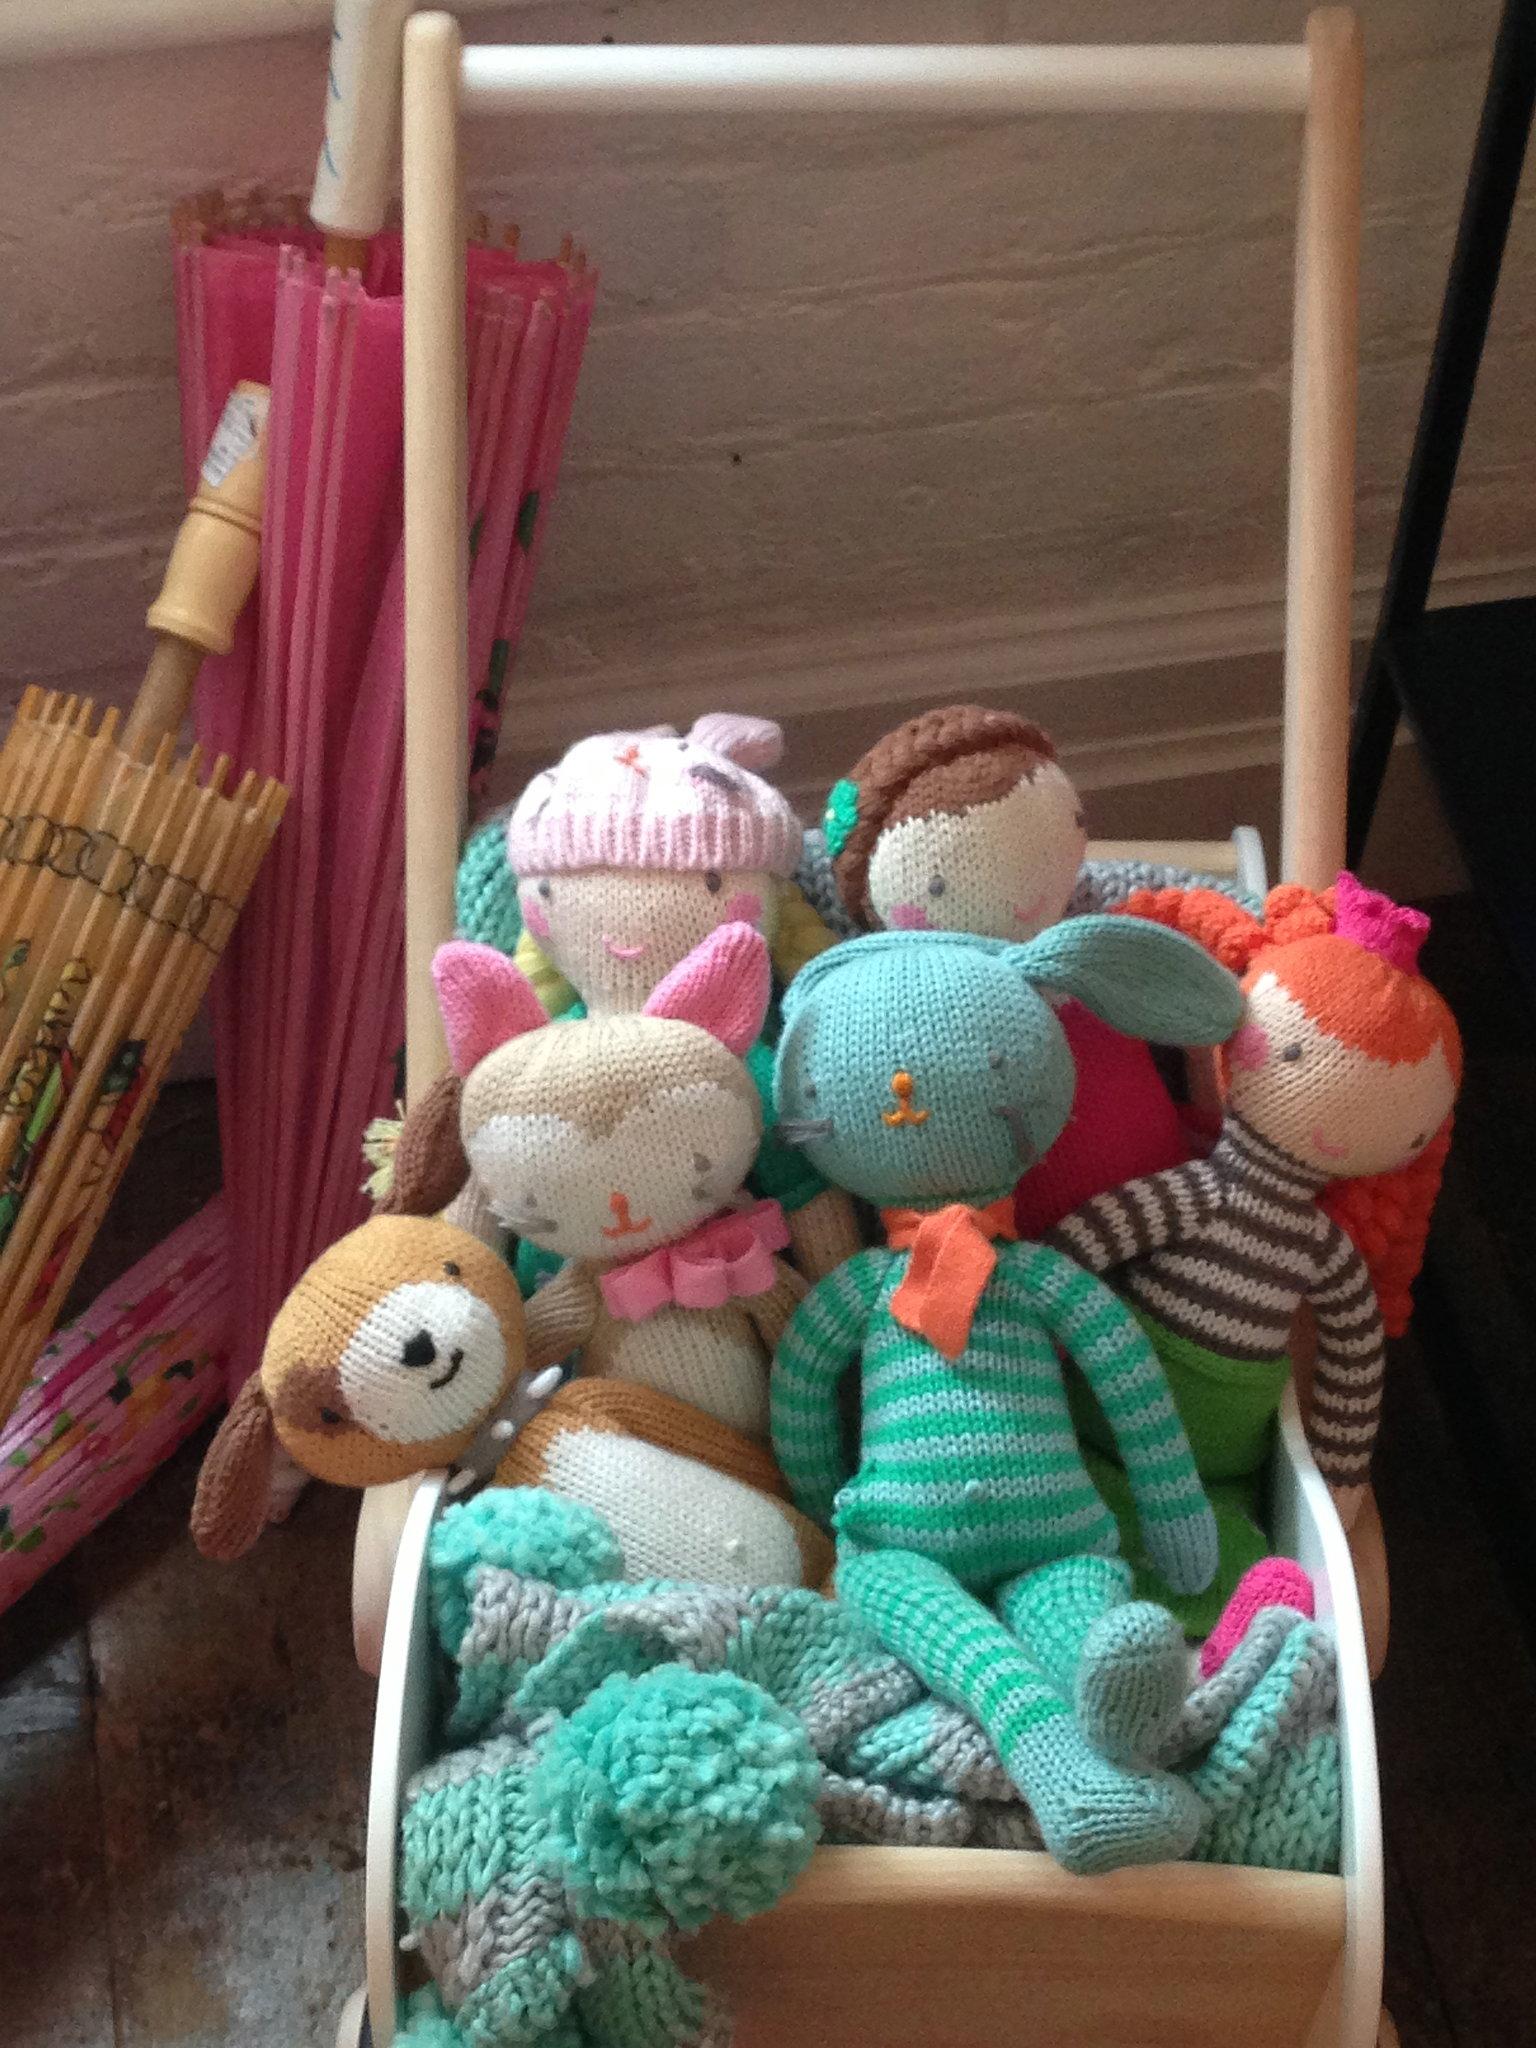 A pretty, minimalist stroller full of knit friends.